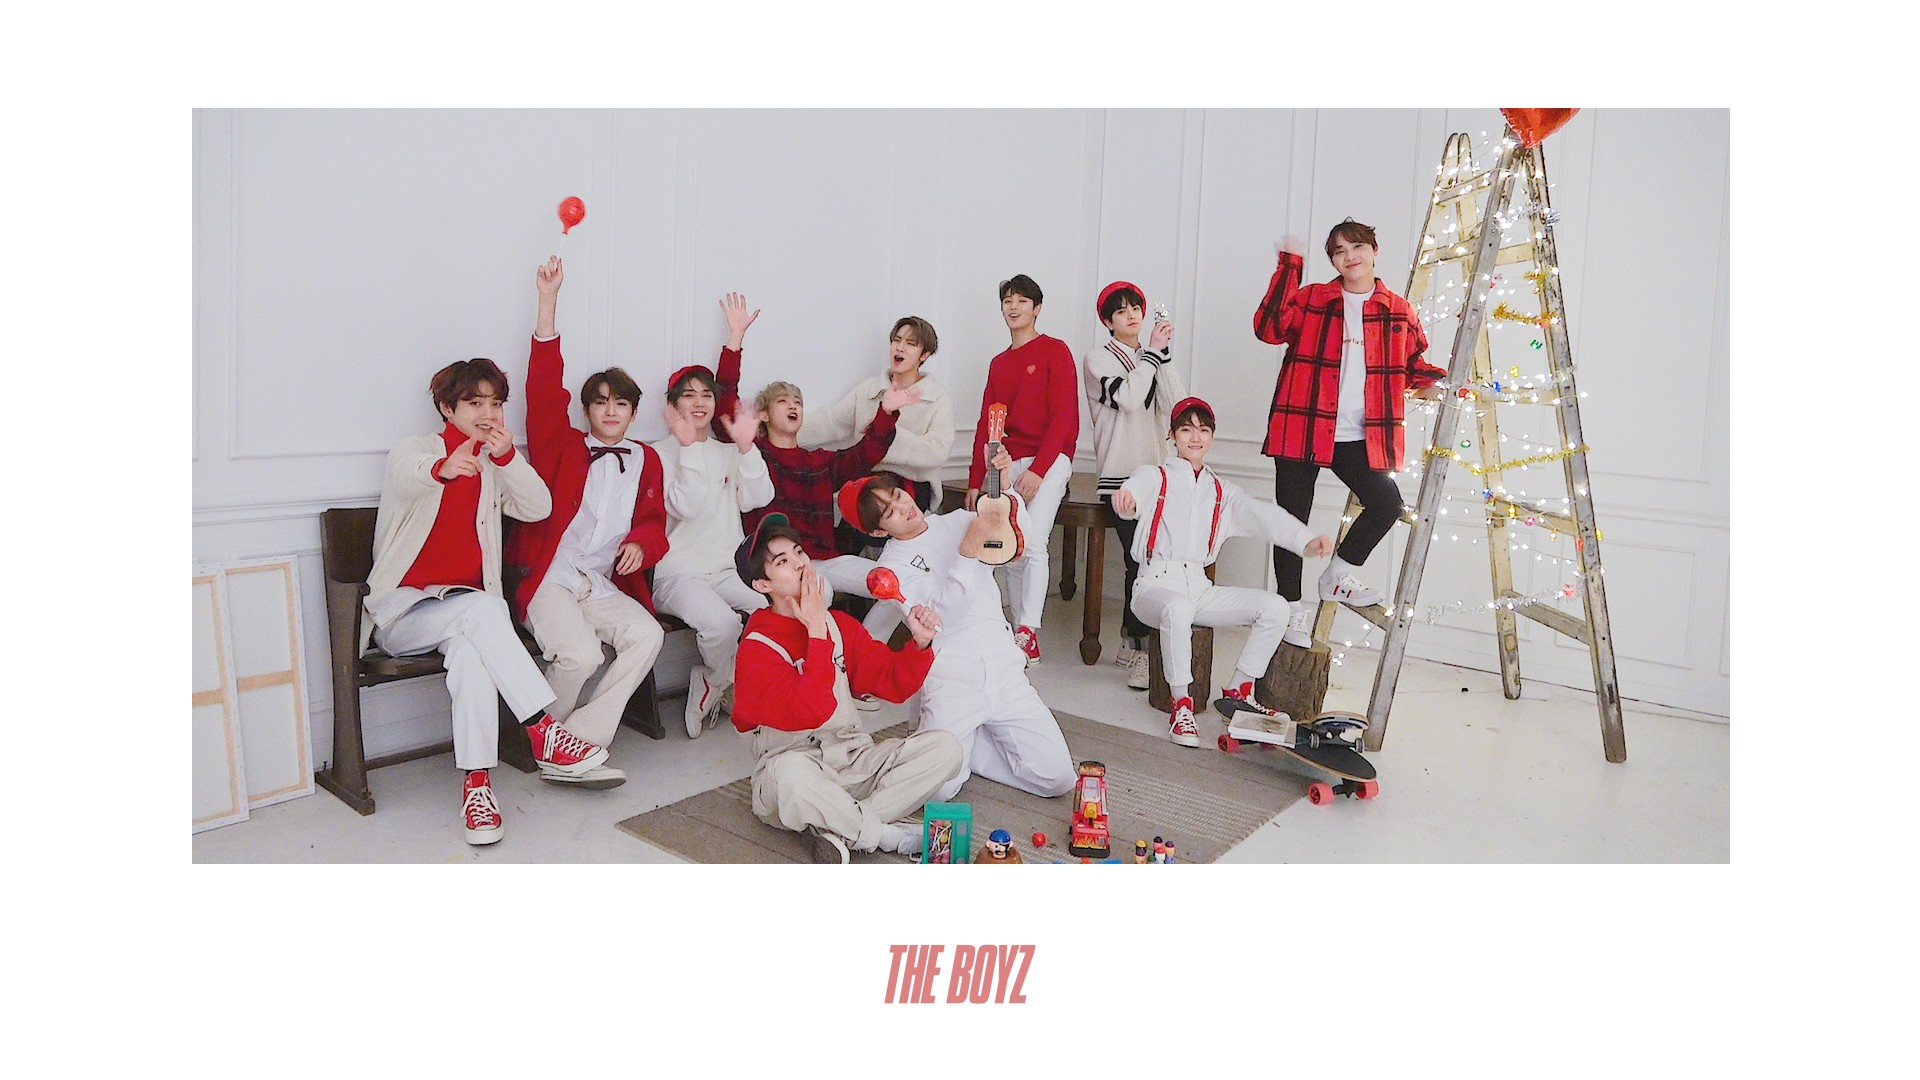 THE BOYZ(더보이즈) Merry Christmas to THE B